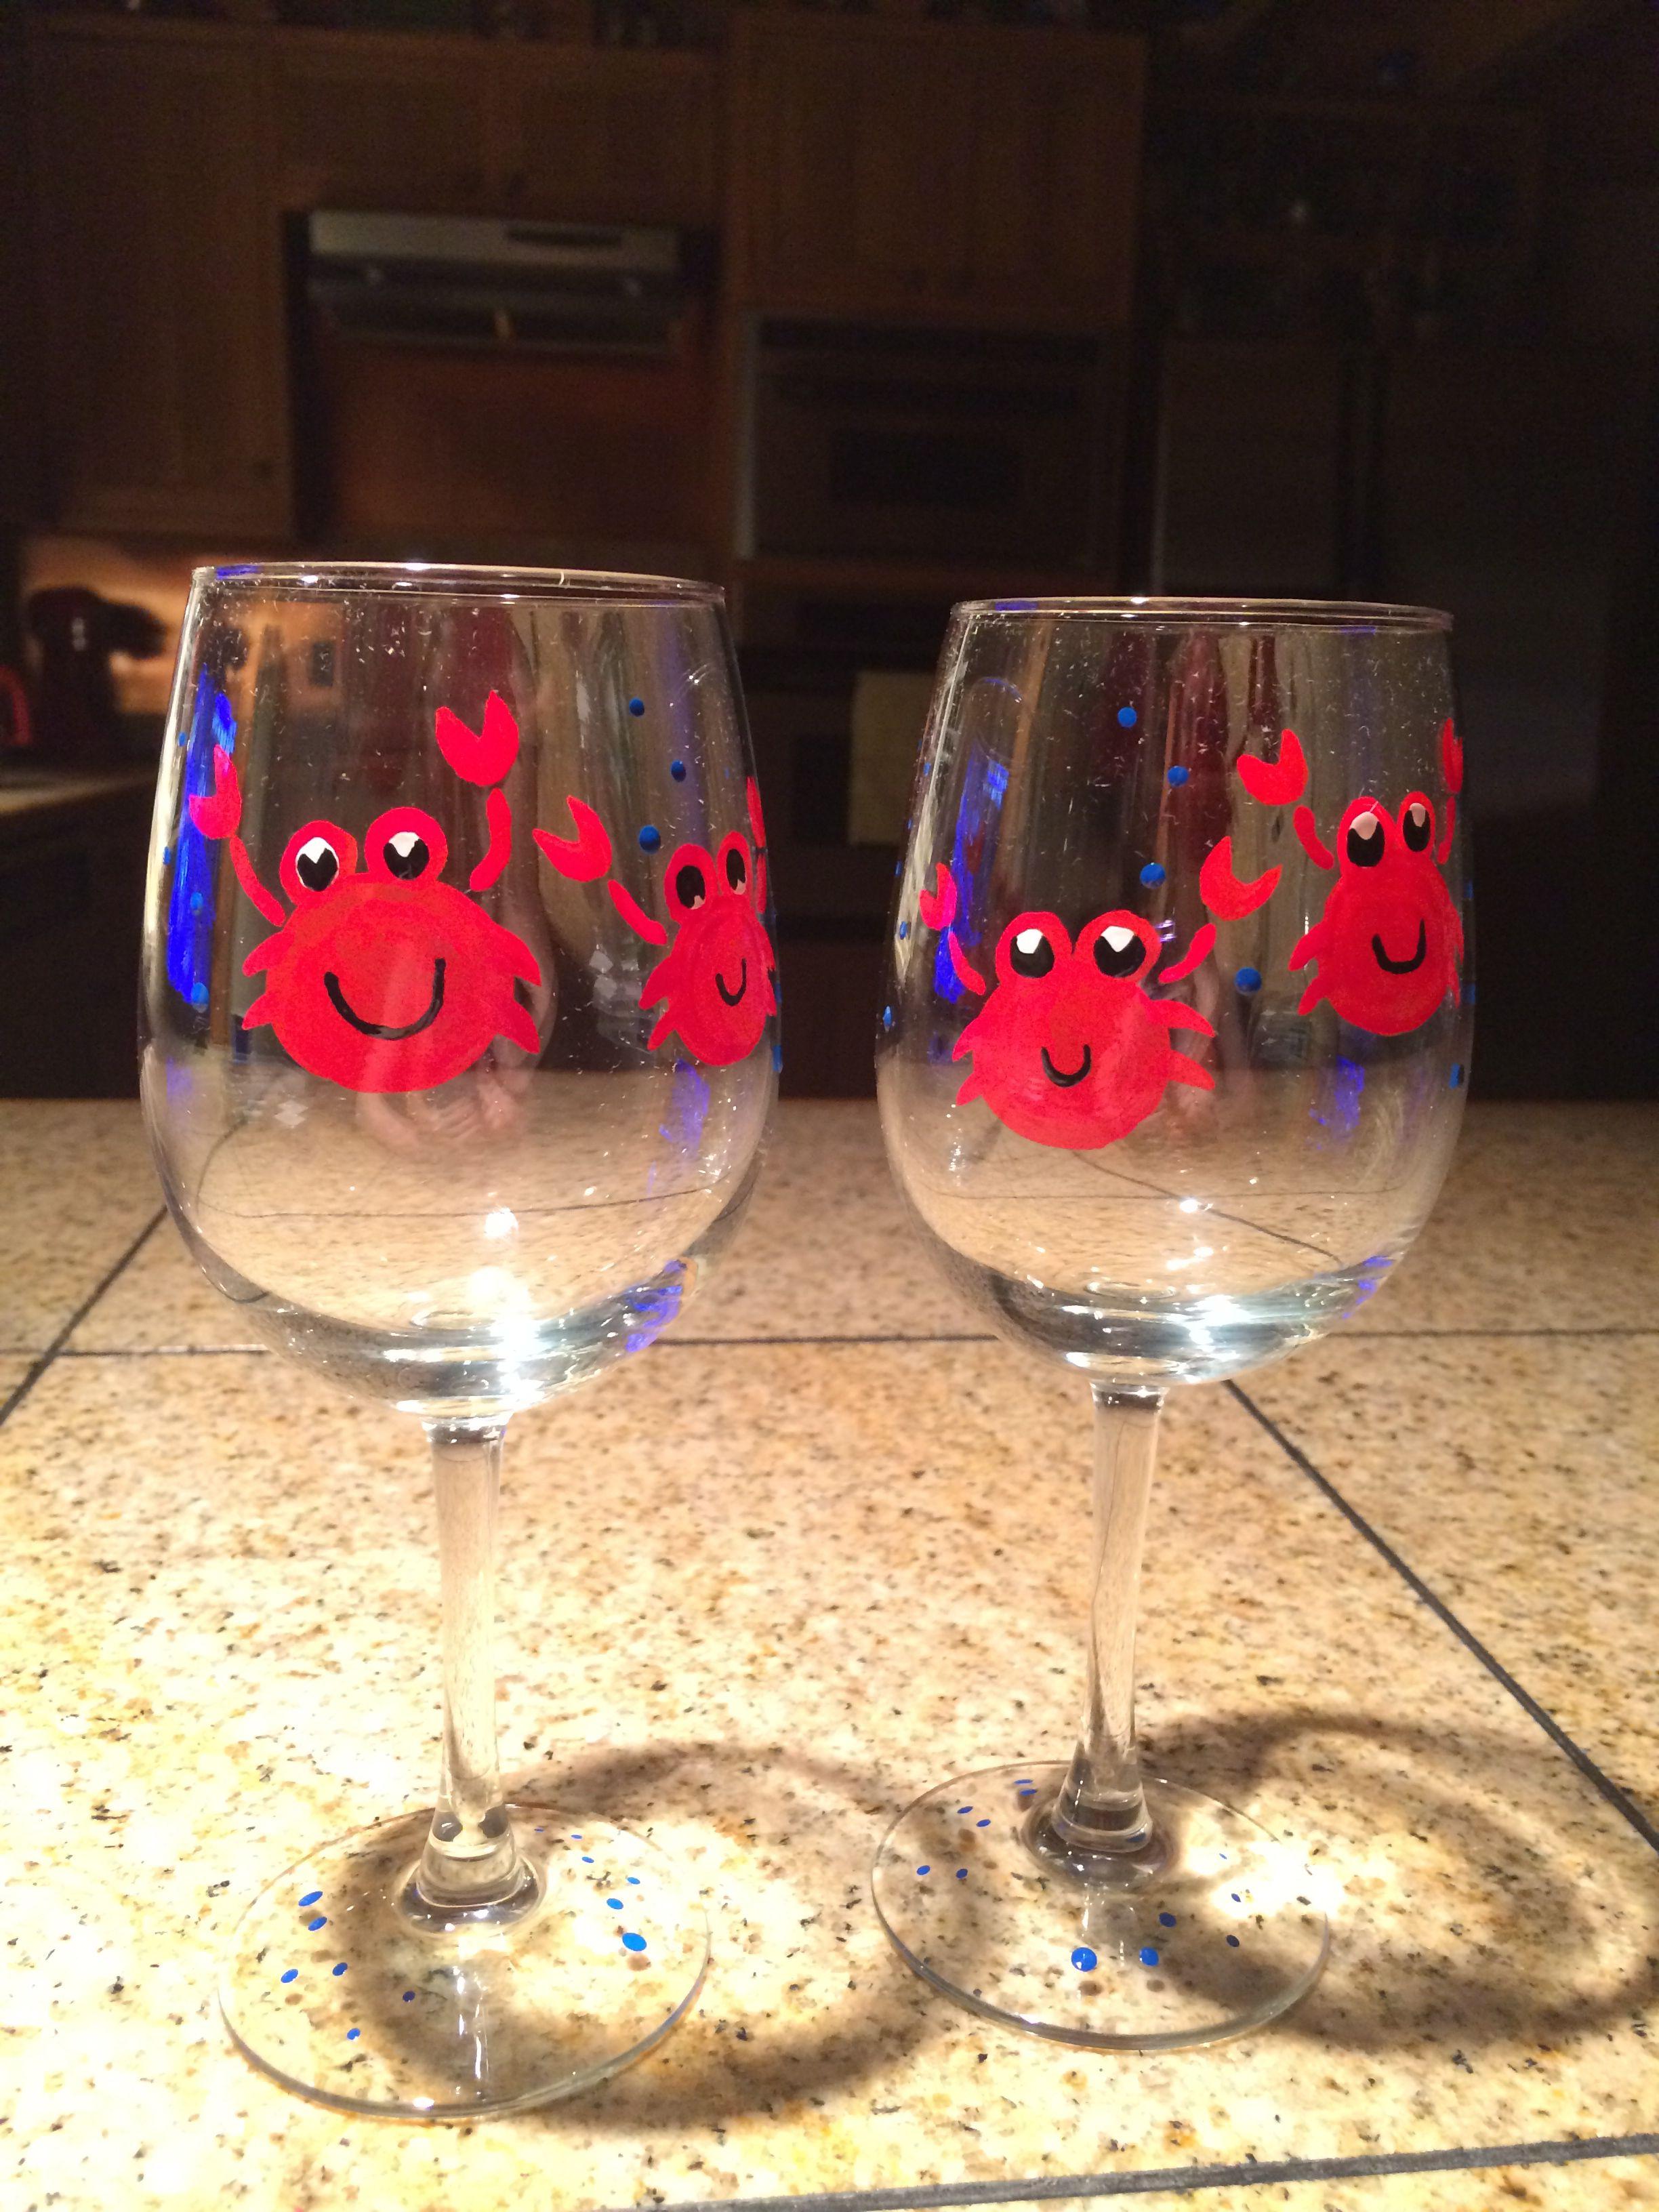 More painted wine glasses  Testors enamel paint from Hobby Lobby